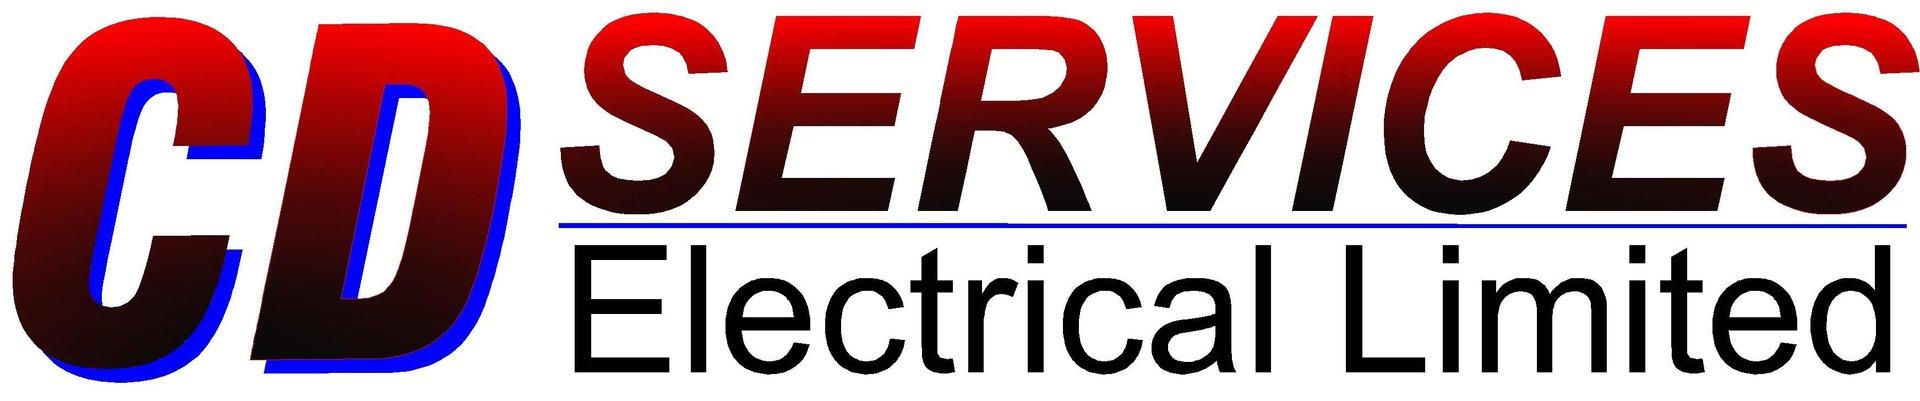 CD Services Electrical Ltd